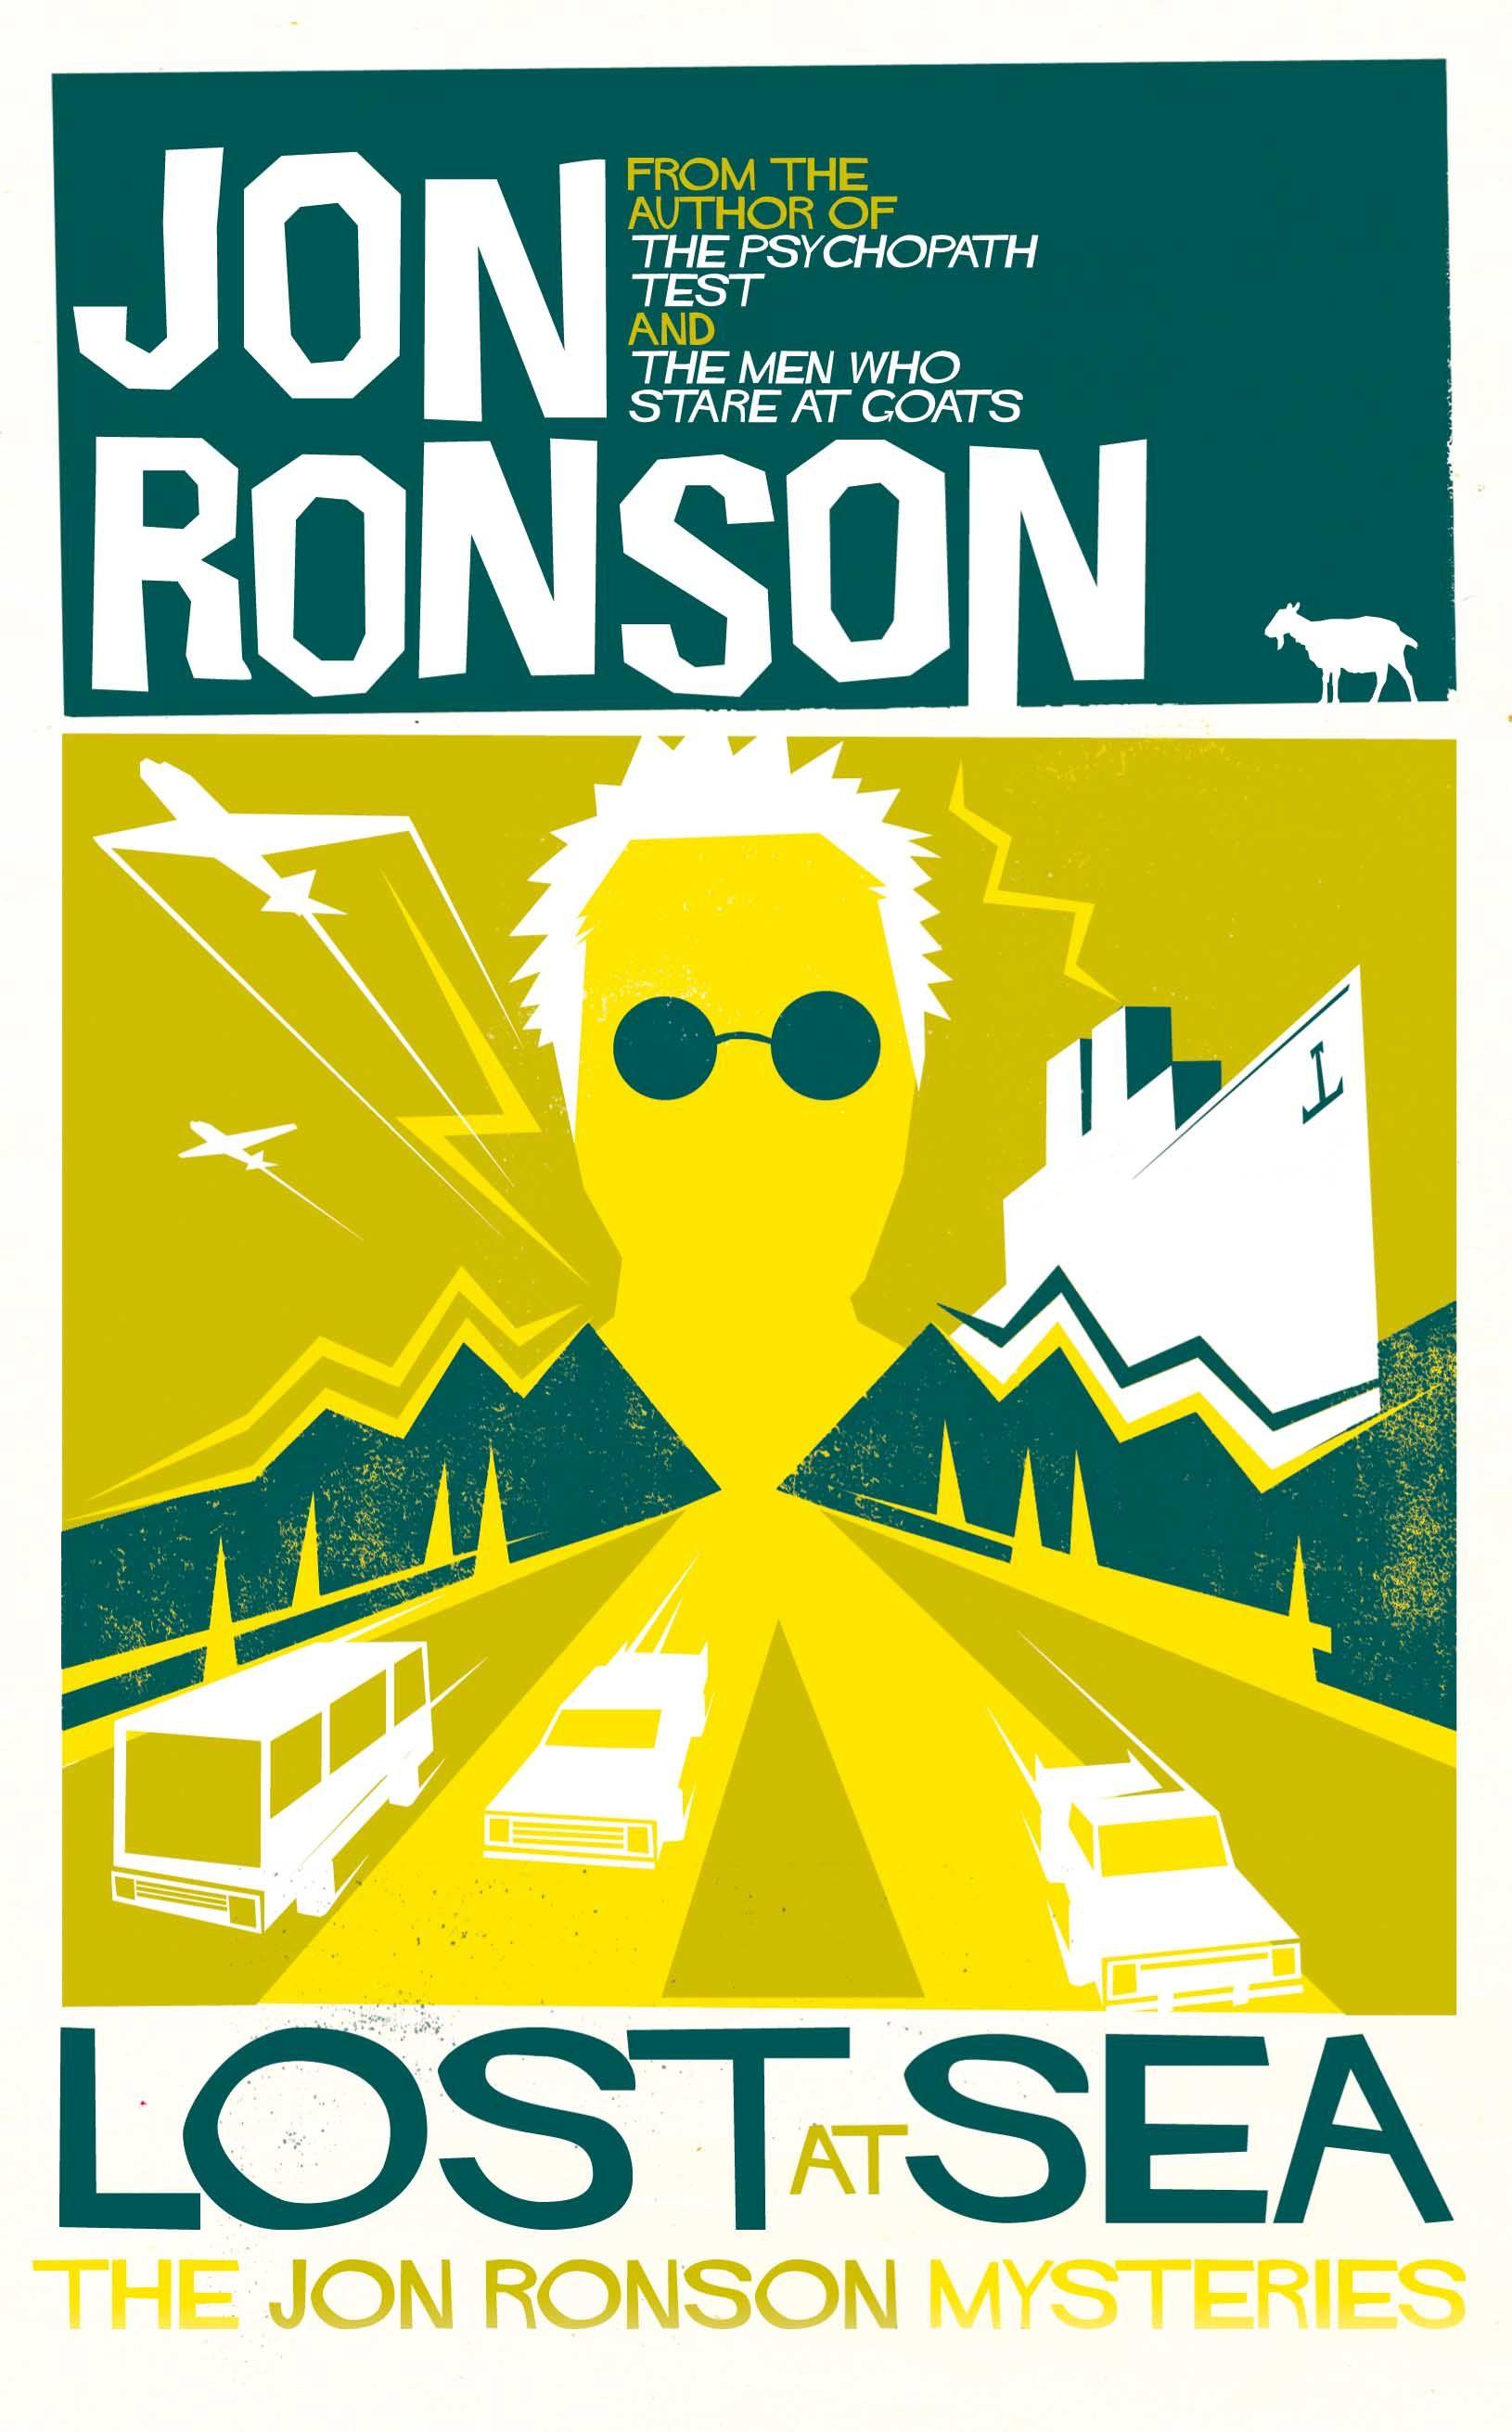 Lost at sea by jon ronson jon ronson audio books books